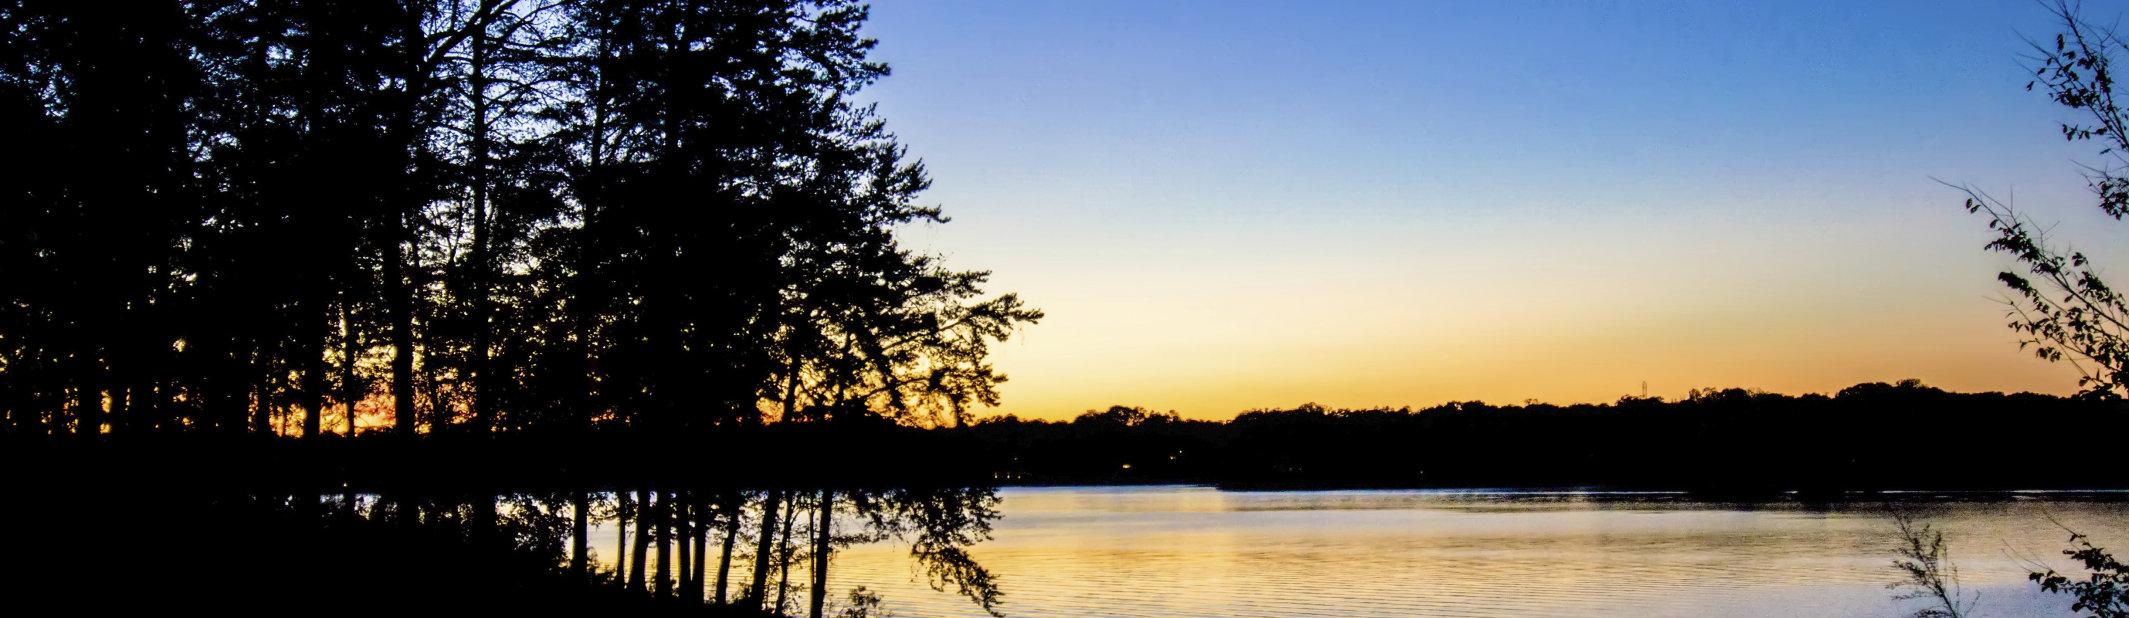 lake_wylie_banner